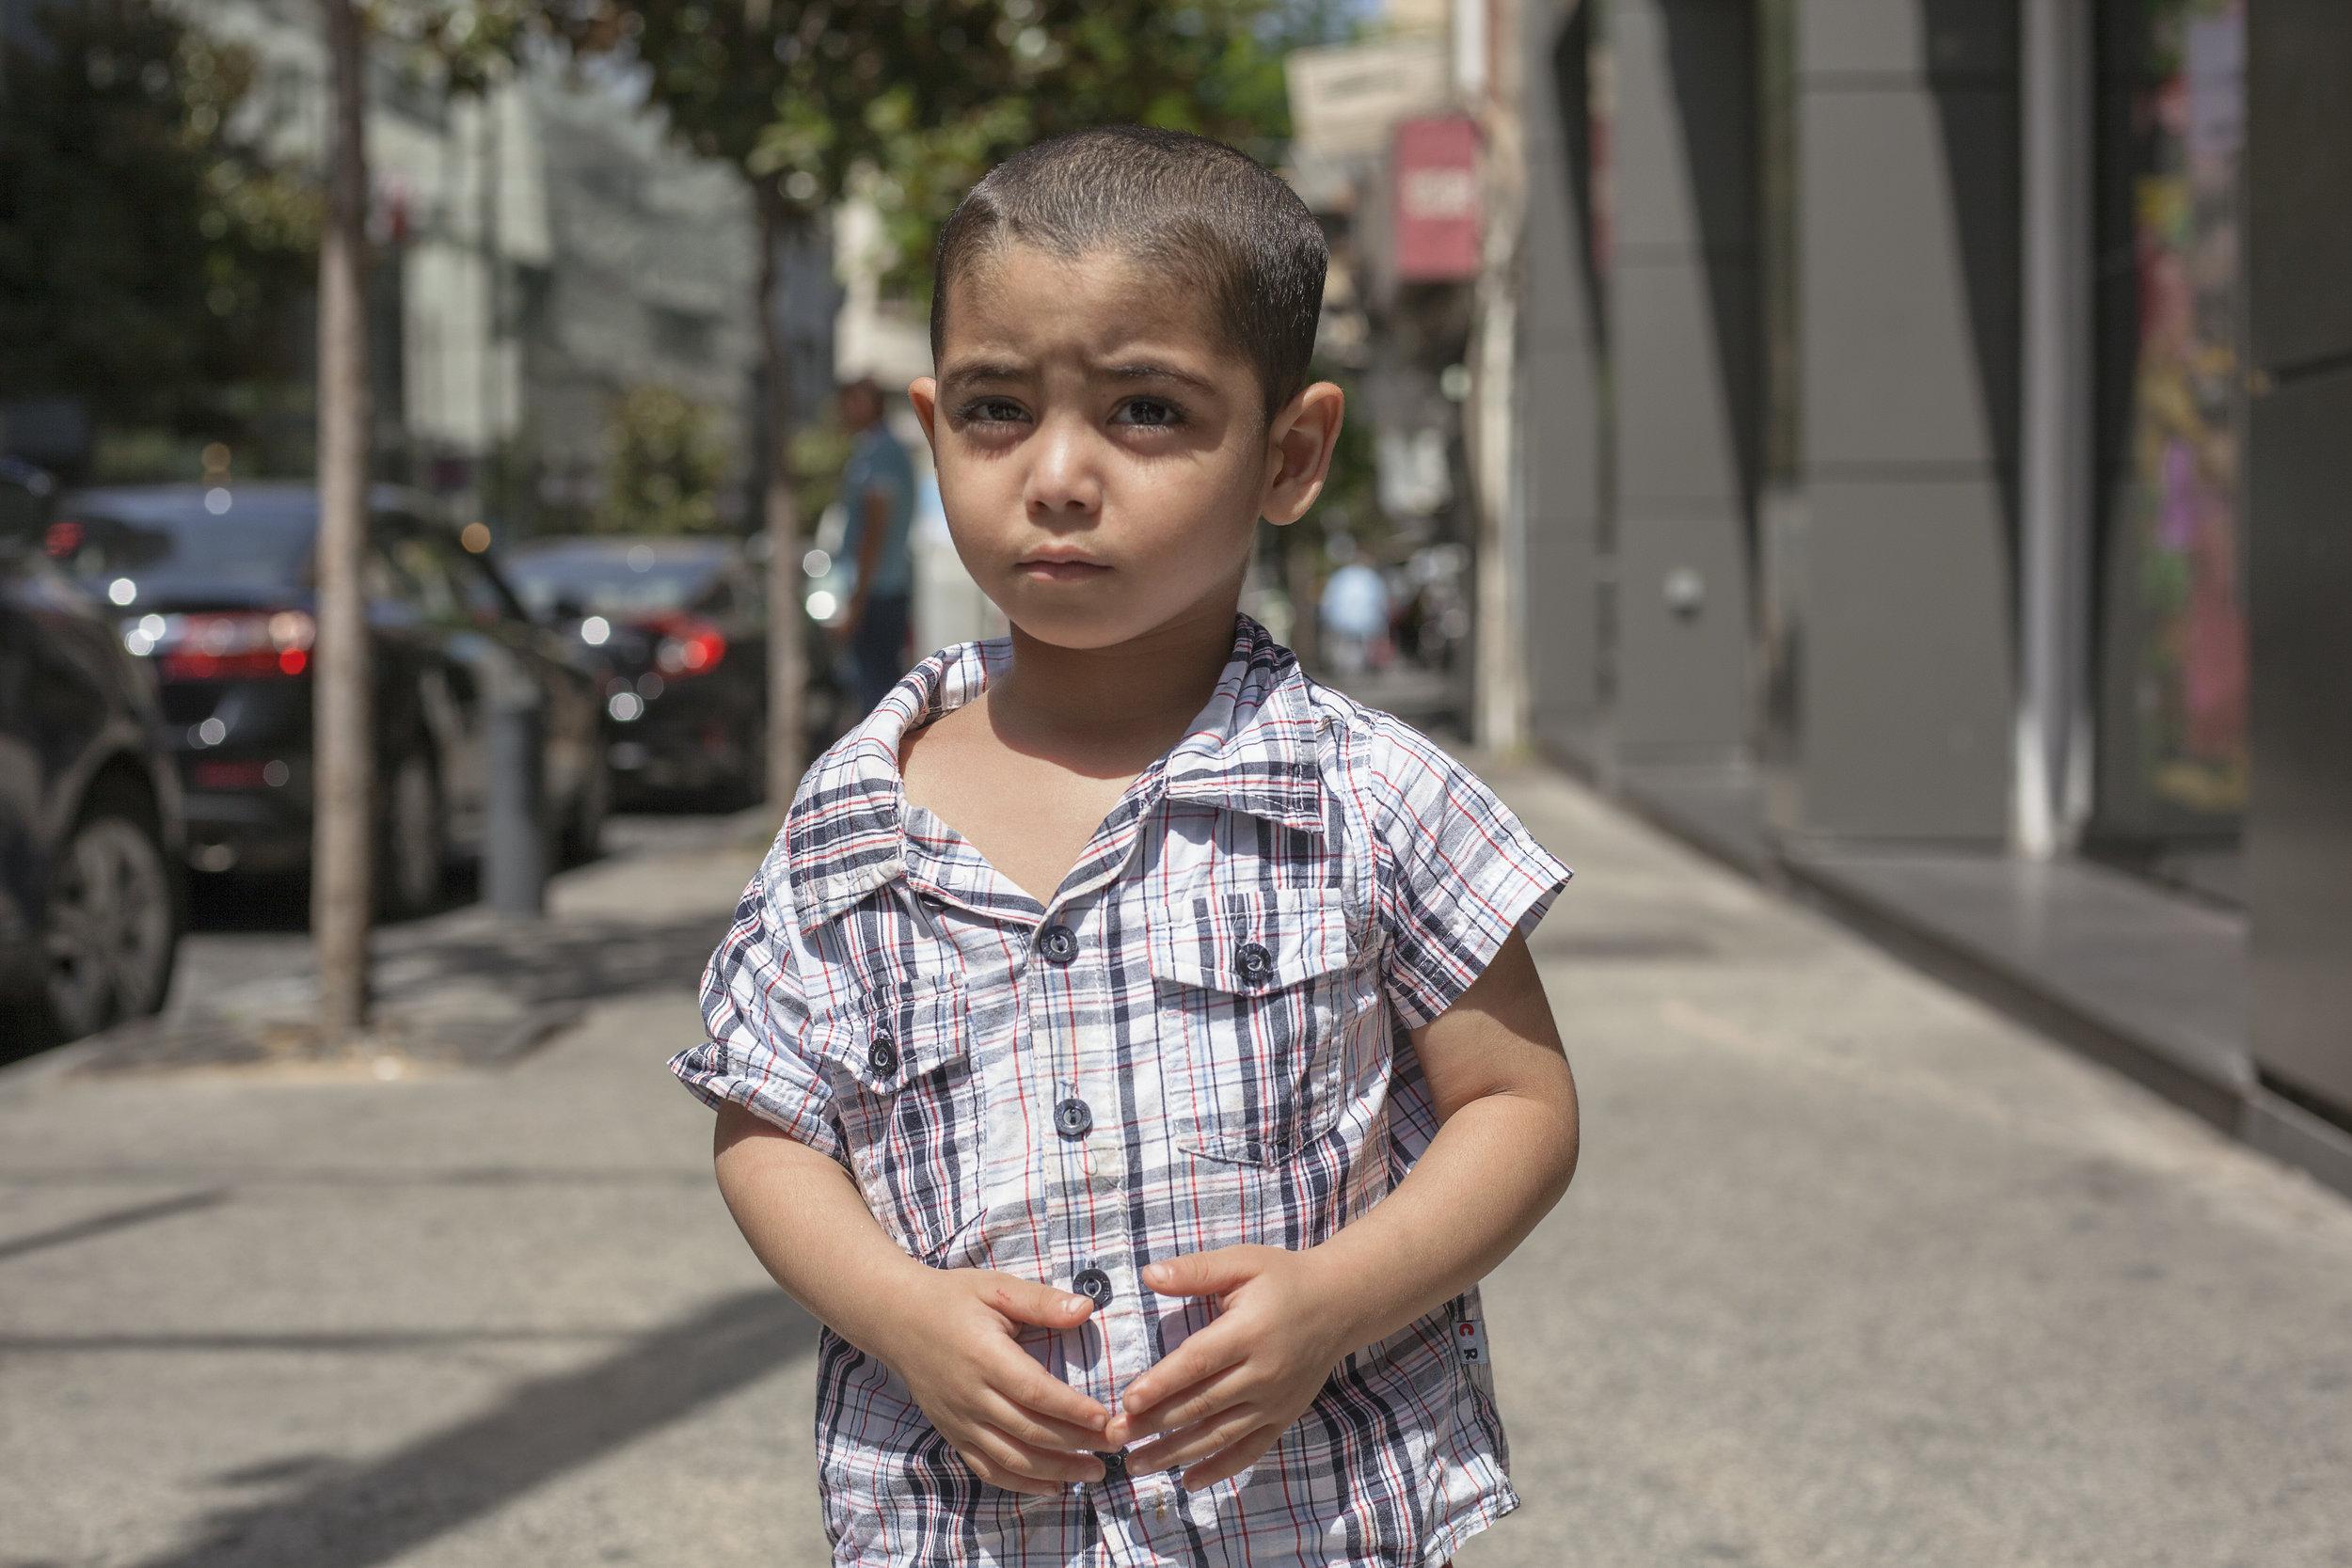 Mahdi INARA Syrian refugee Arwa Damon